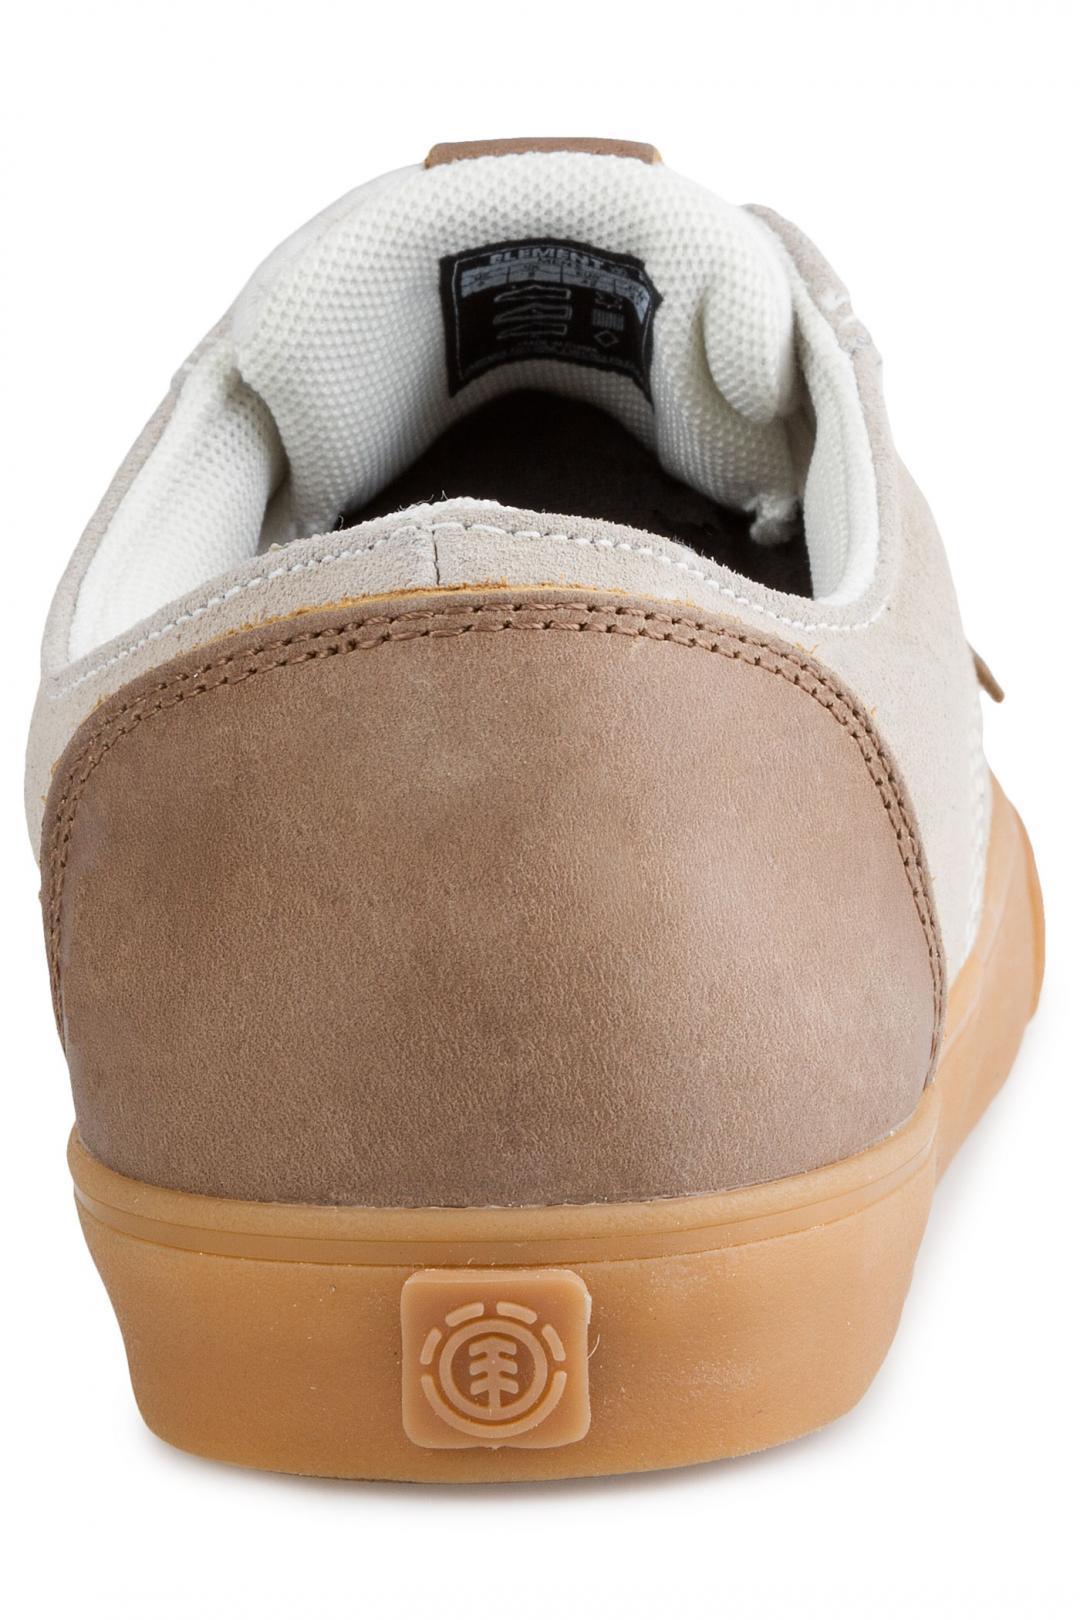 Uomo Element Topaz C3 off white   Sneakers low top